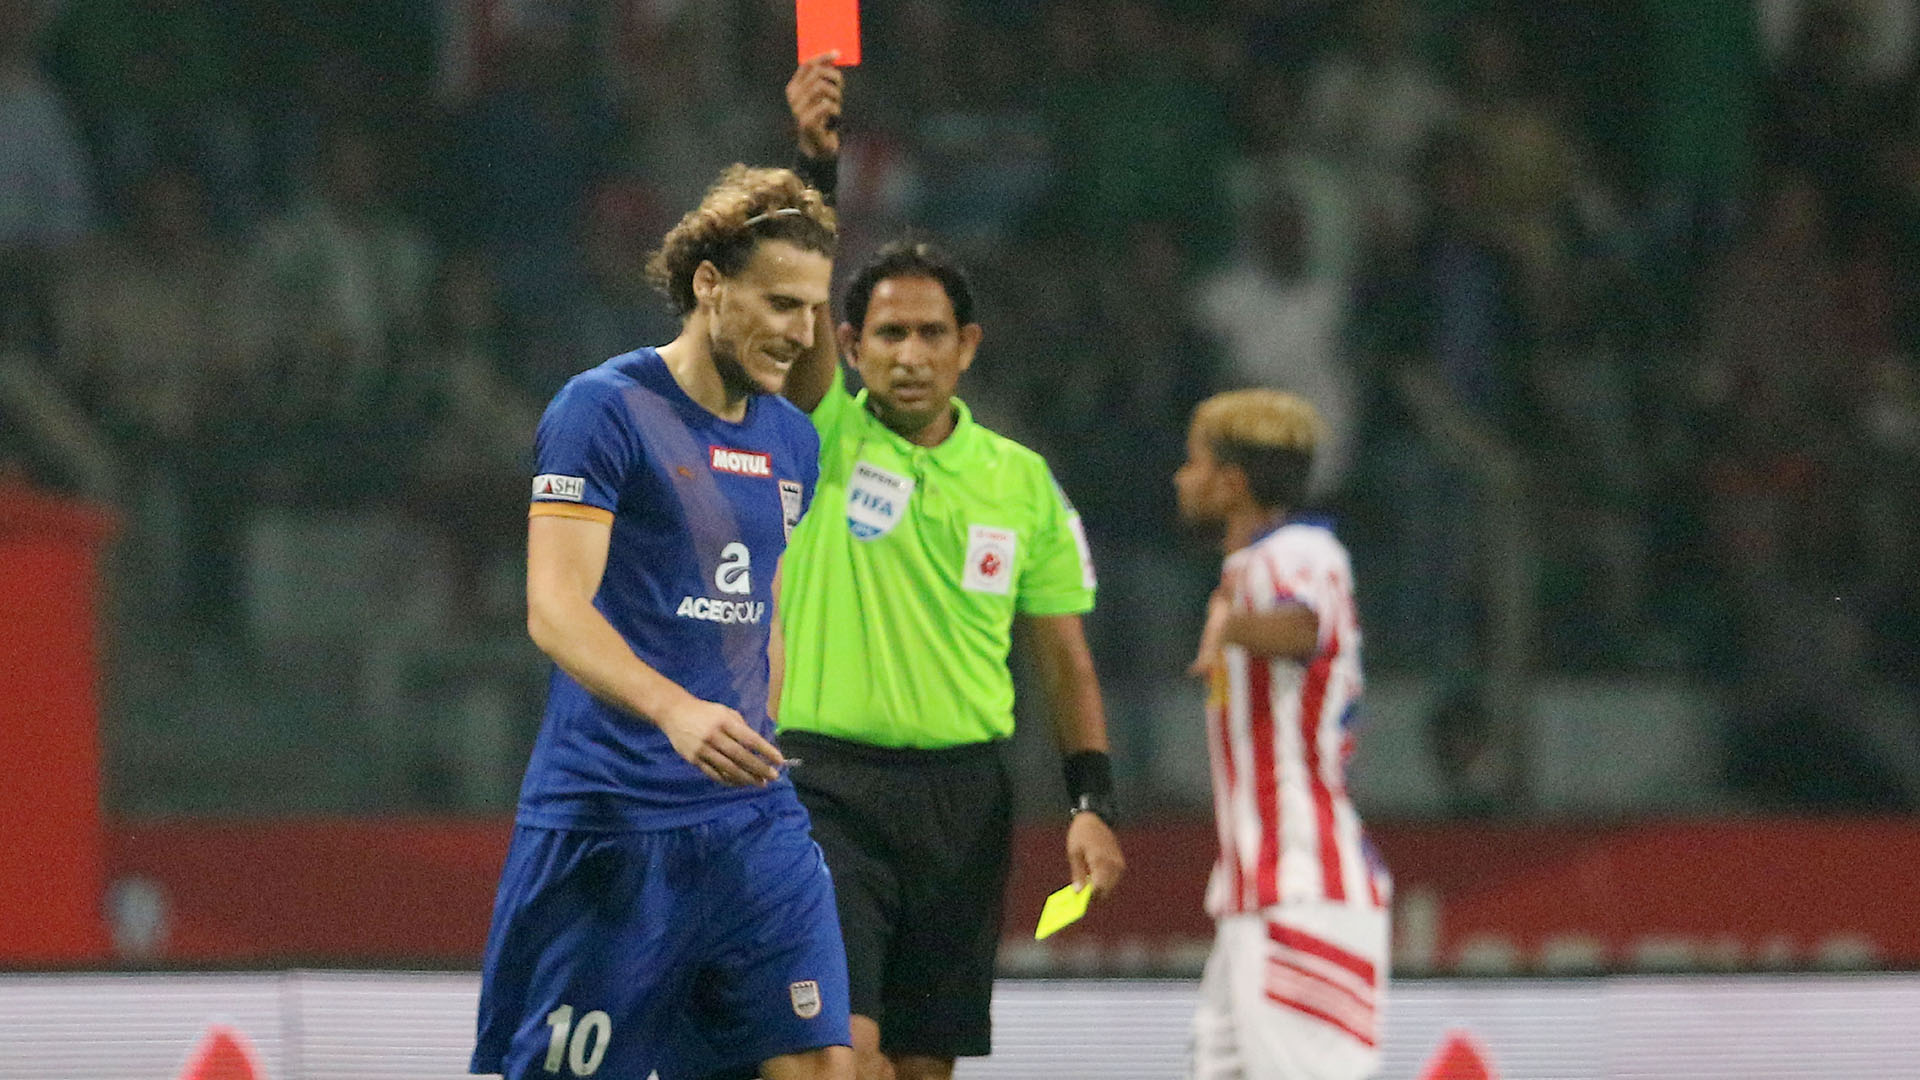 Diego Forlan Atletico de Kolkata Mumbai City FC ISL semi final season 3 2016